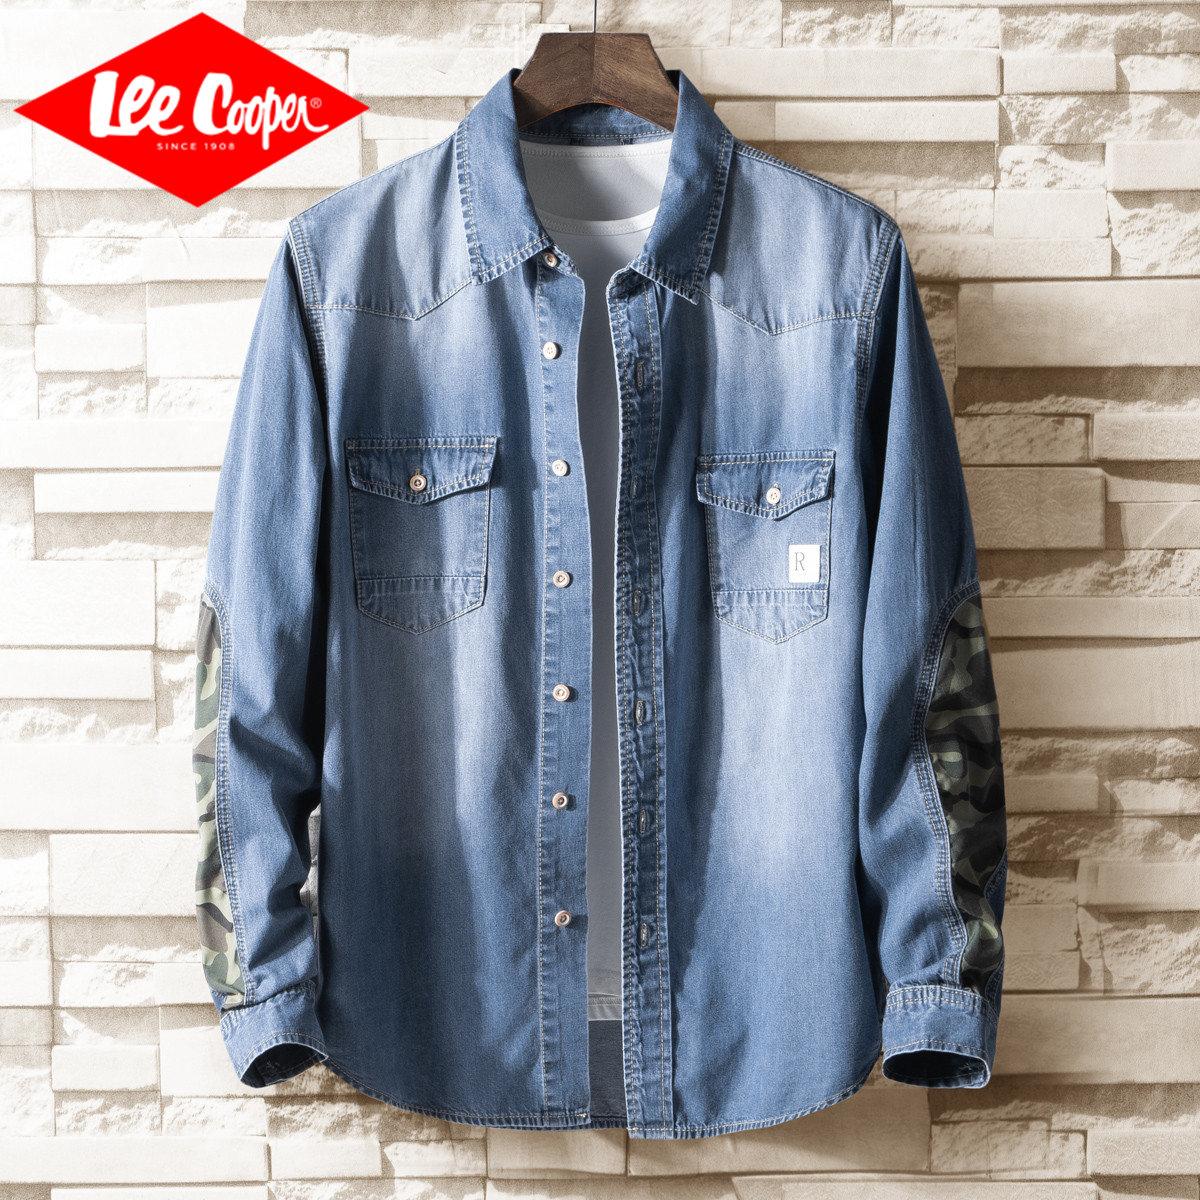 Lee Cooper 迷彩拼接青少年长袖衬衣纯棉潮流薄款牛仔男士衬衫